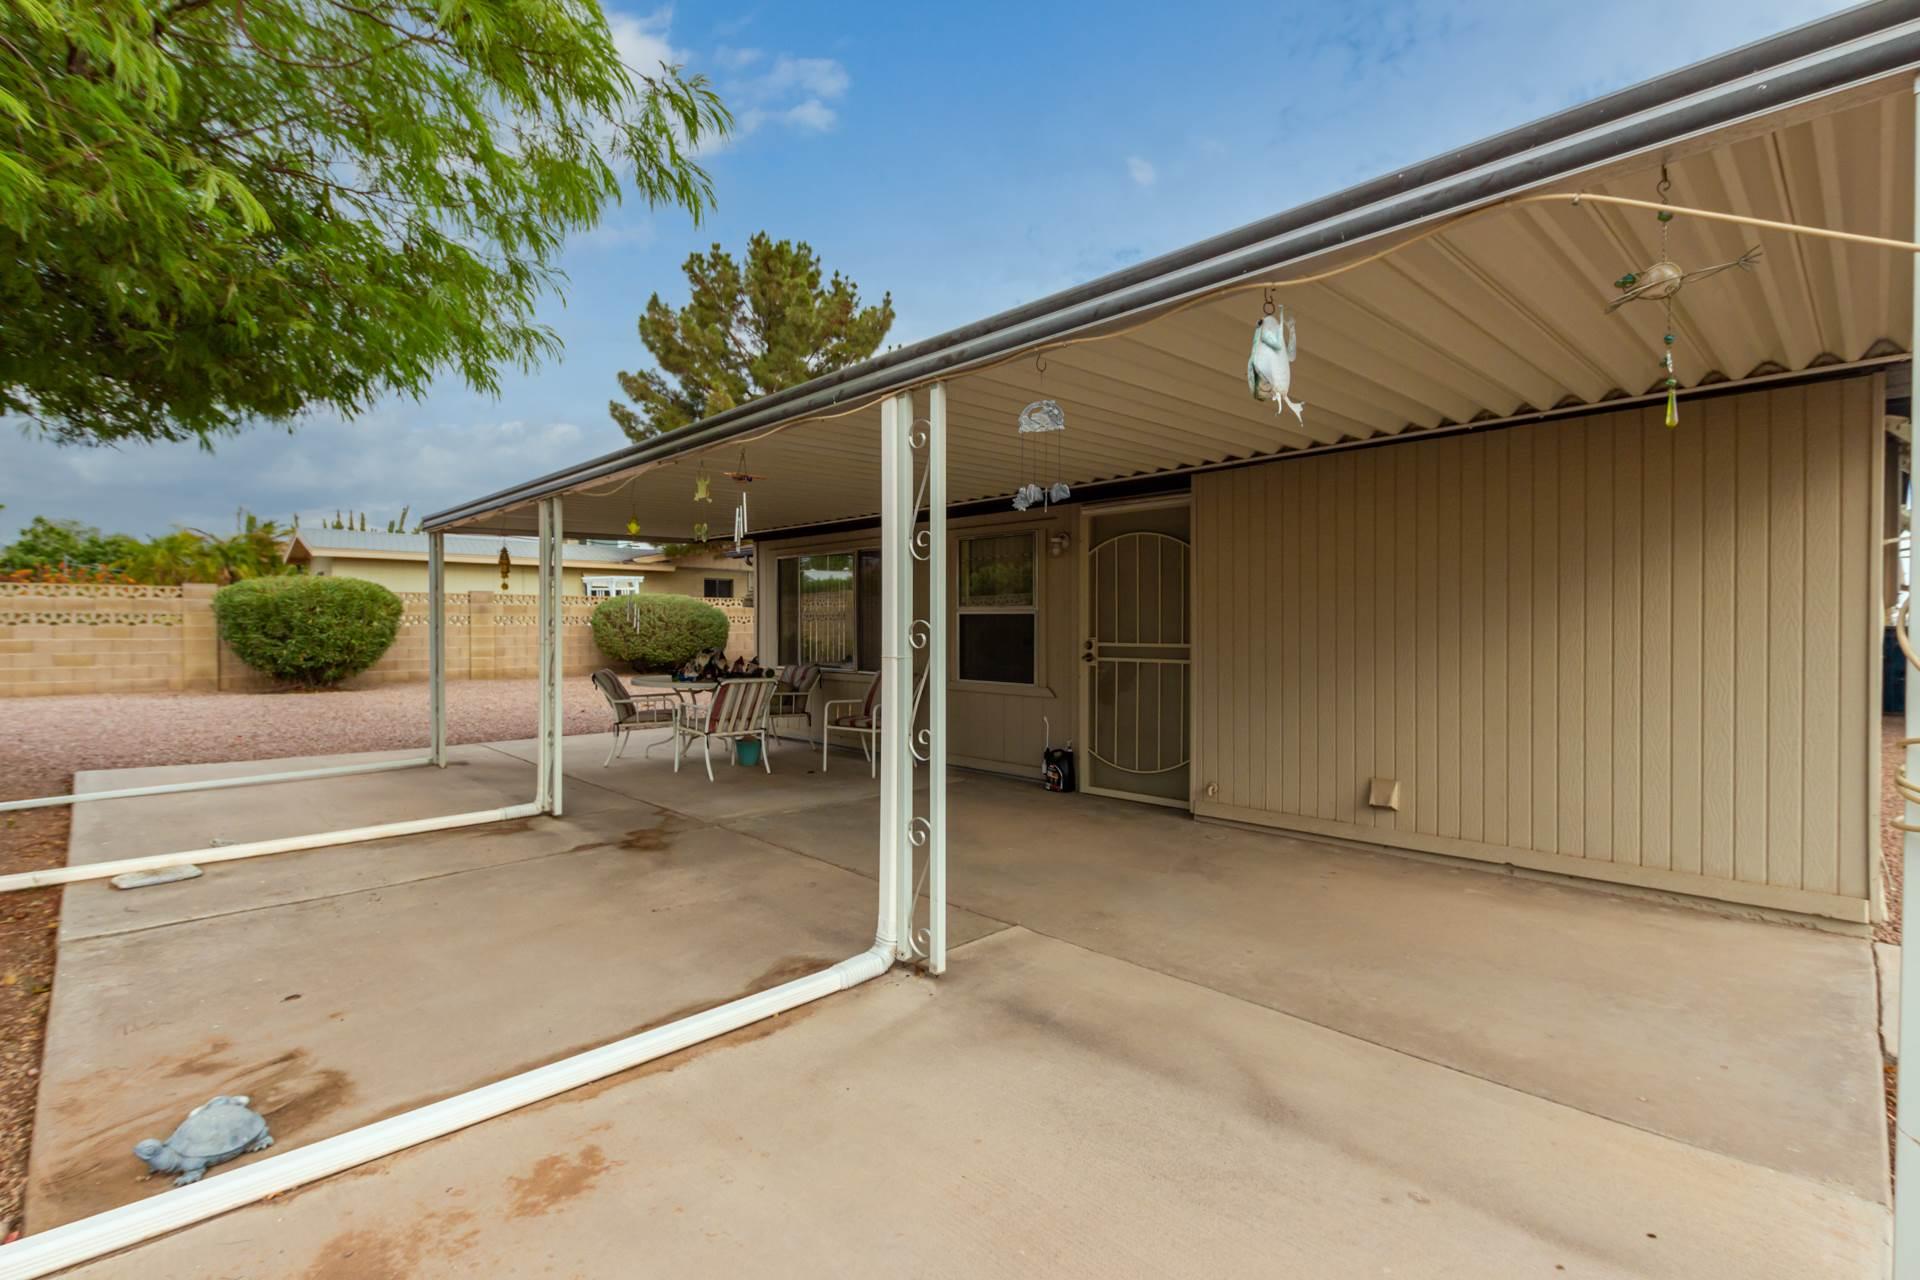 1766 W 14th Ave, Apache Junction, AZ 85120